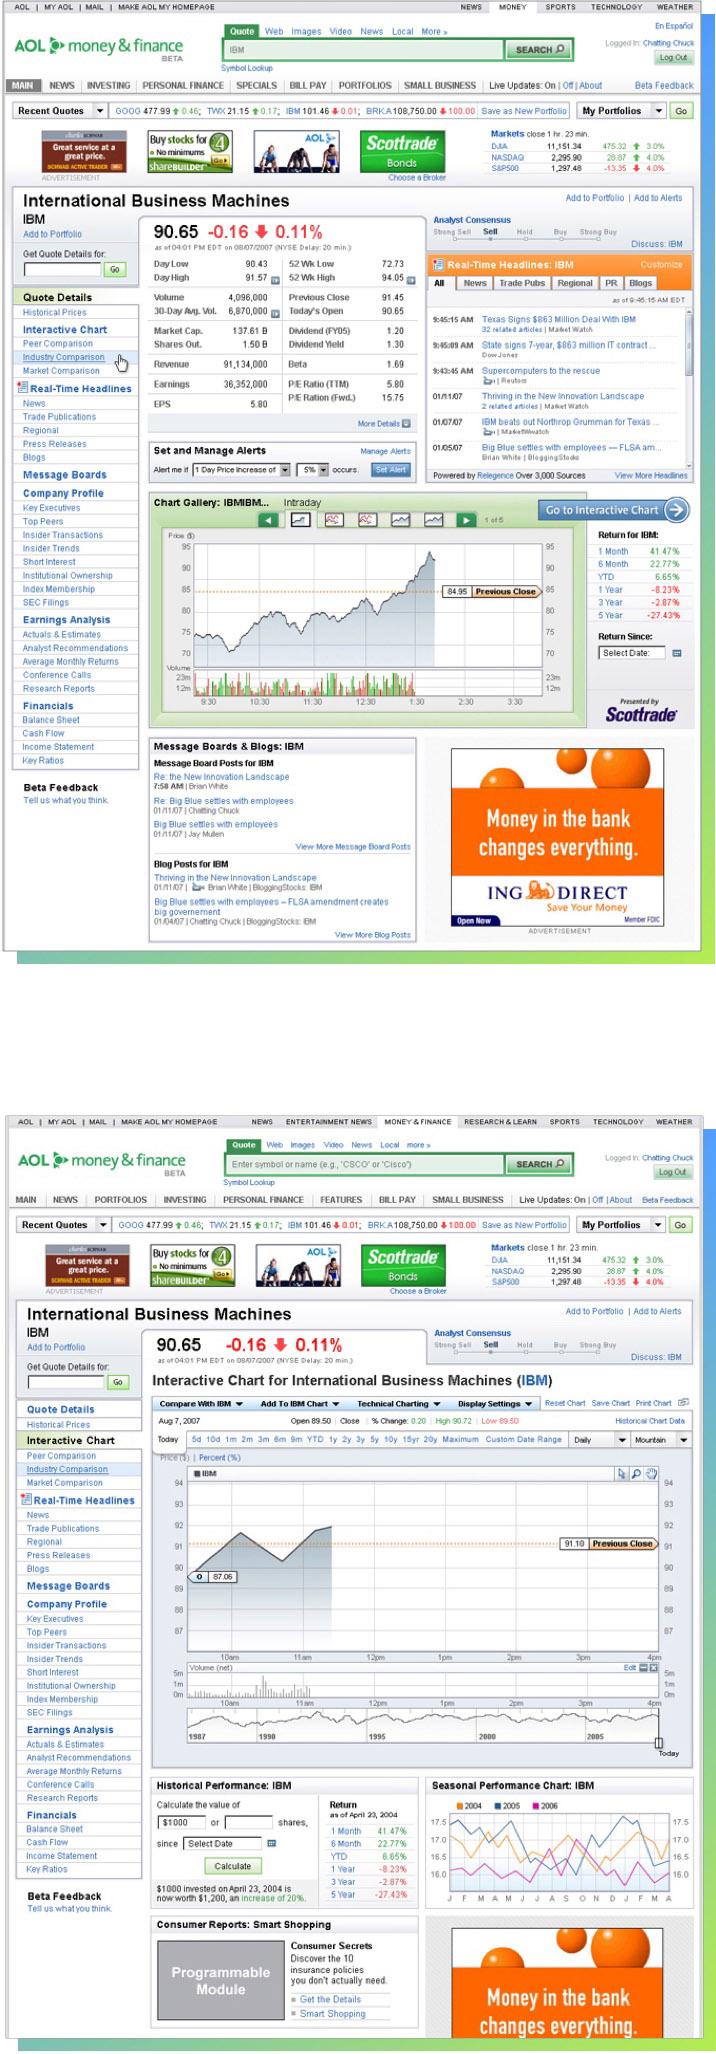 portfolio - AOL M+F Web 6